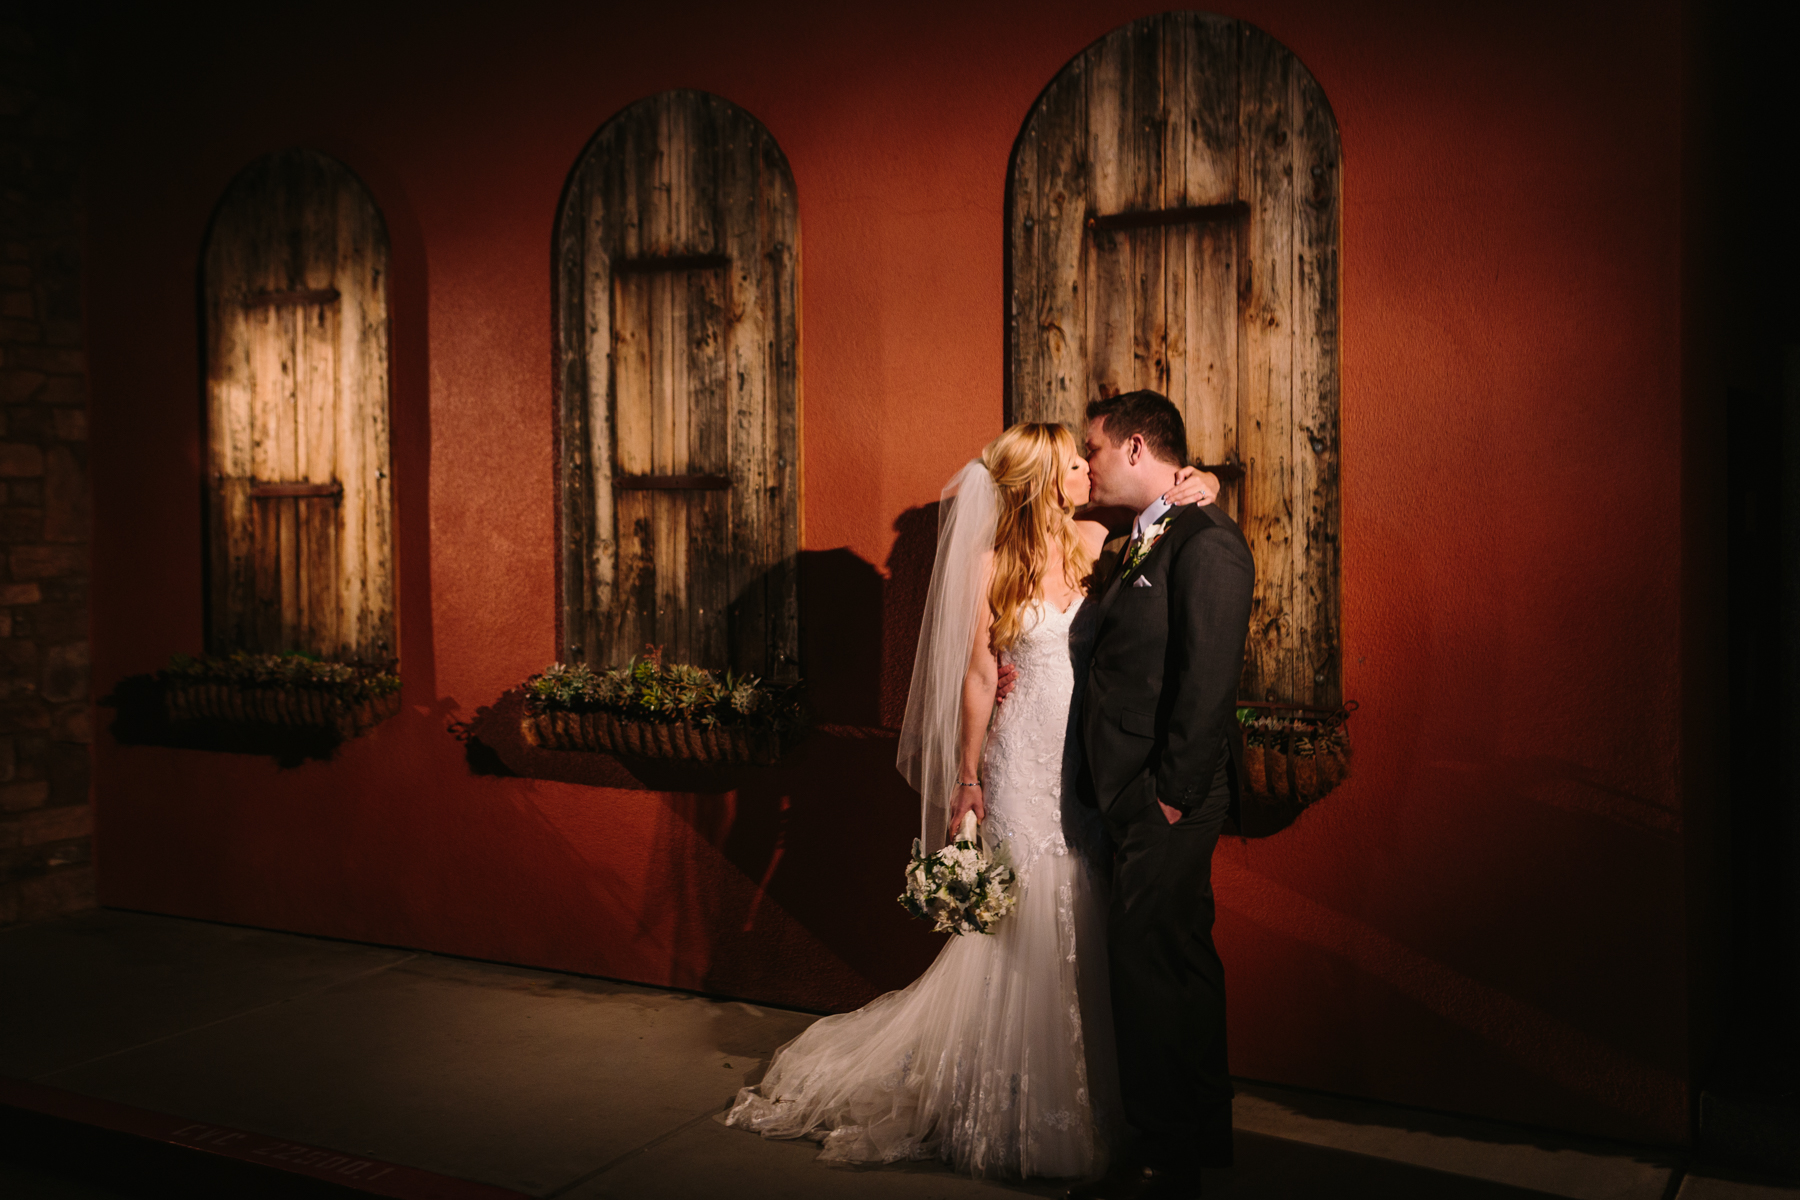 Orange-County-Wedding-Photography-Brianna-Caster-and-Co-Photographers-Falkner-Winery-Wedding-14